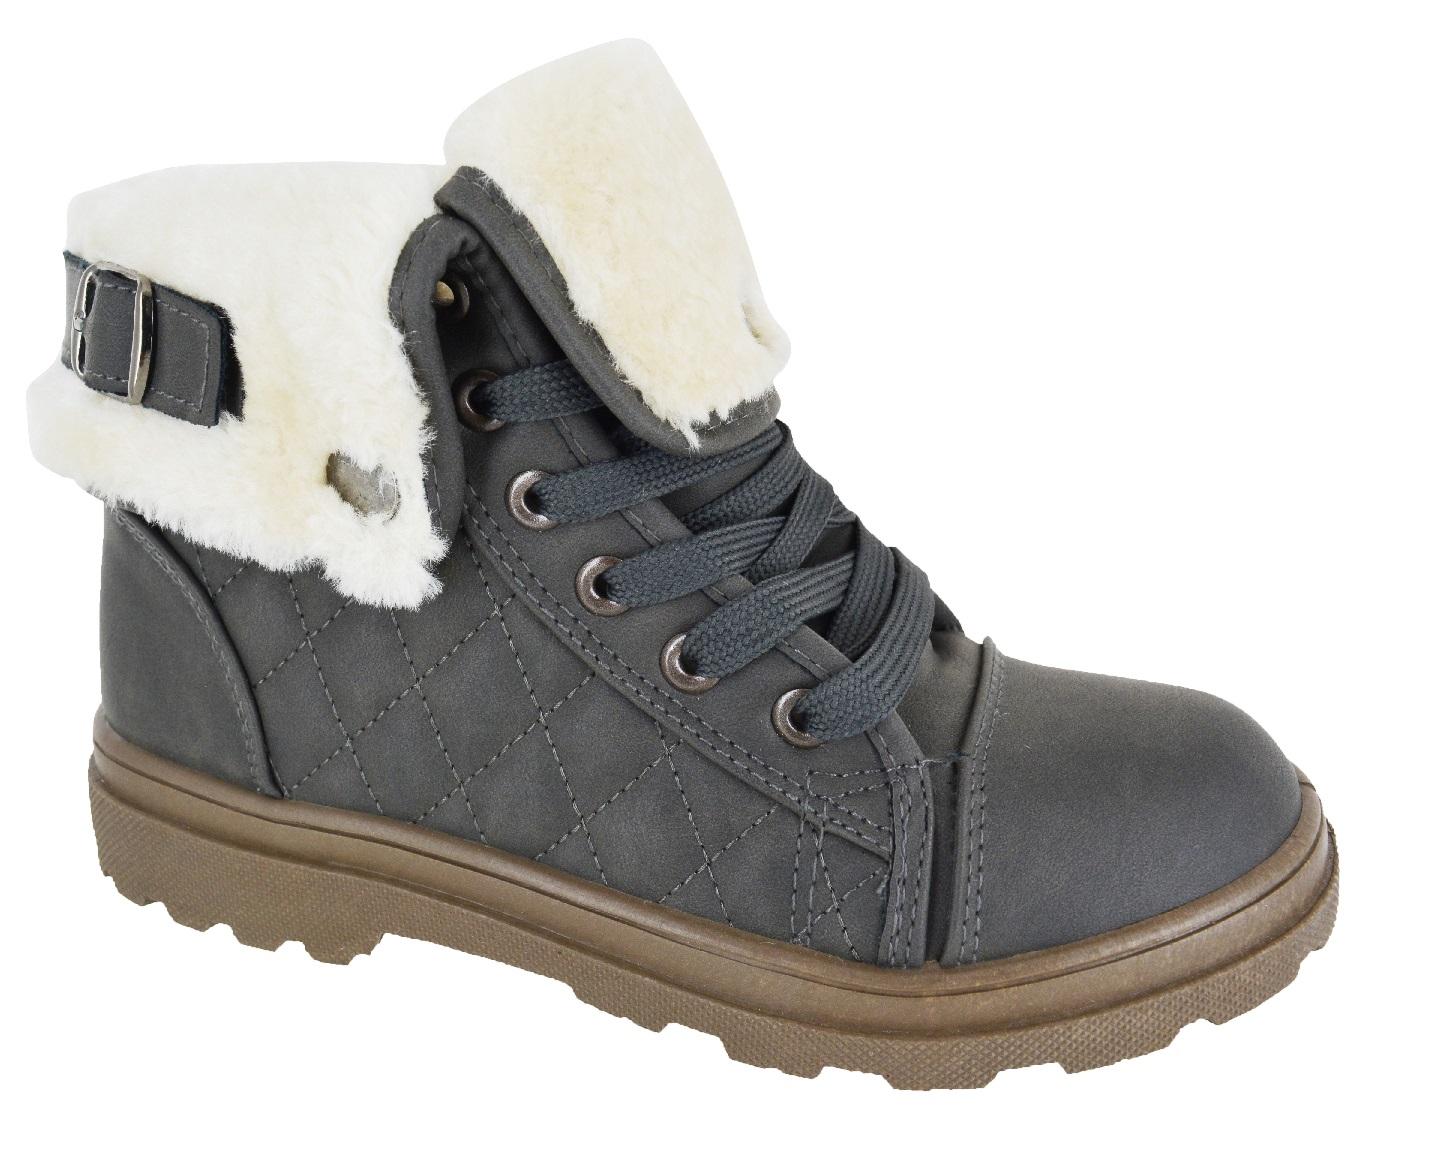 heated winter boots marks work warehouse santa barbara